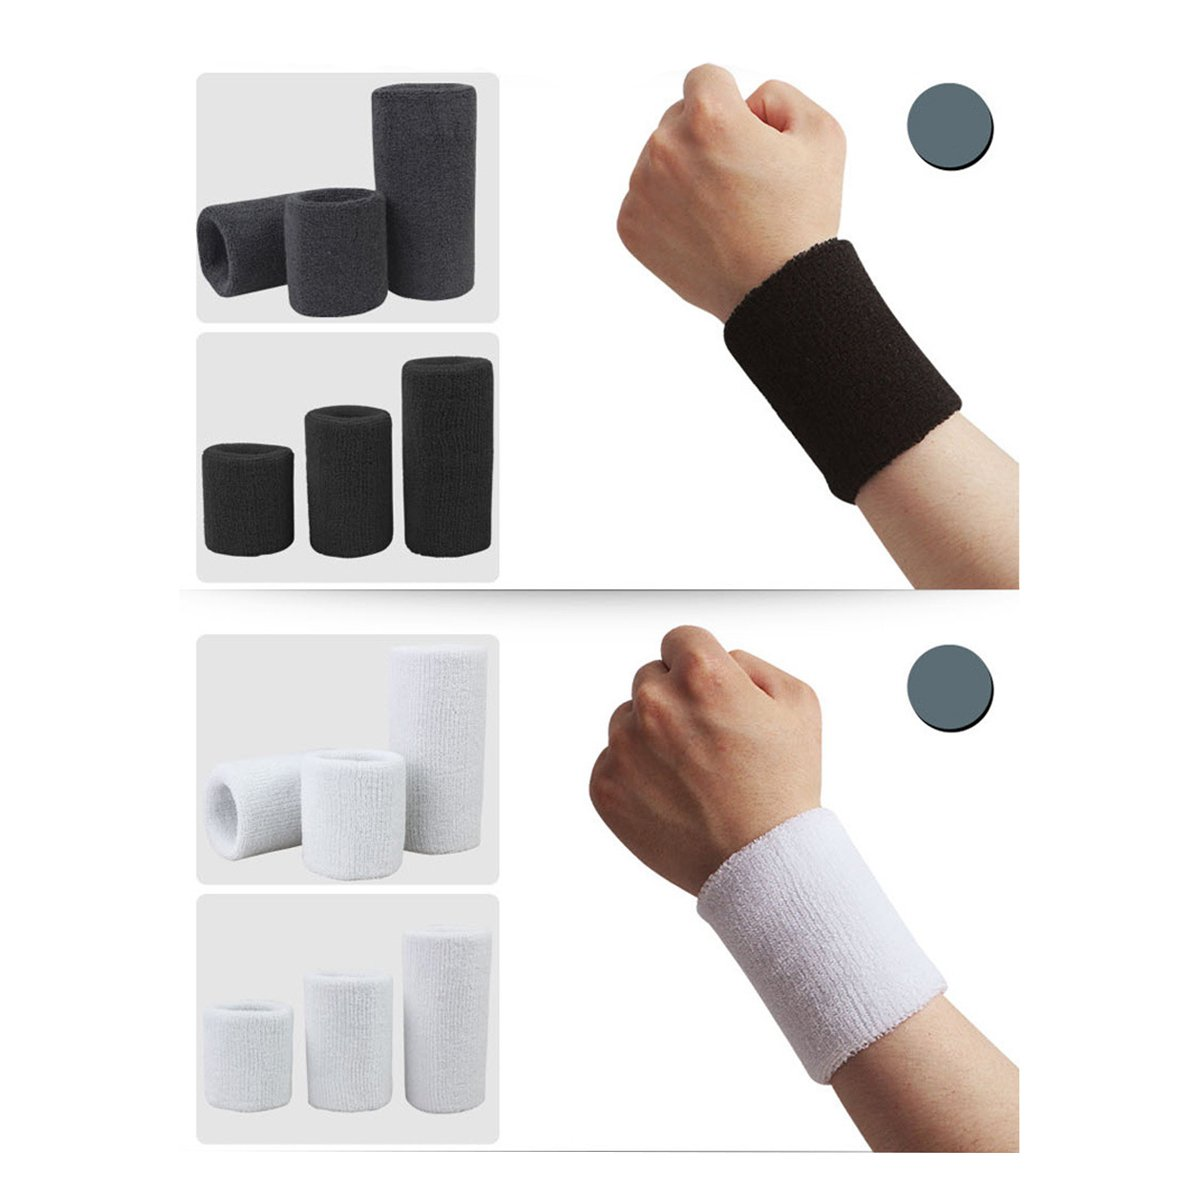 Nero ULTNICE Sport Sweatband Braccialetti Athletic Cotton Terry Cloth Soft Bracers 1 paio